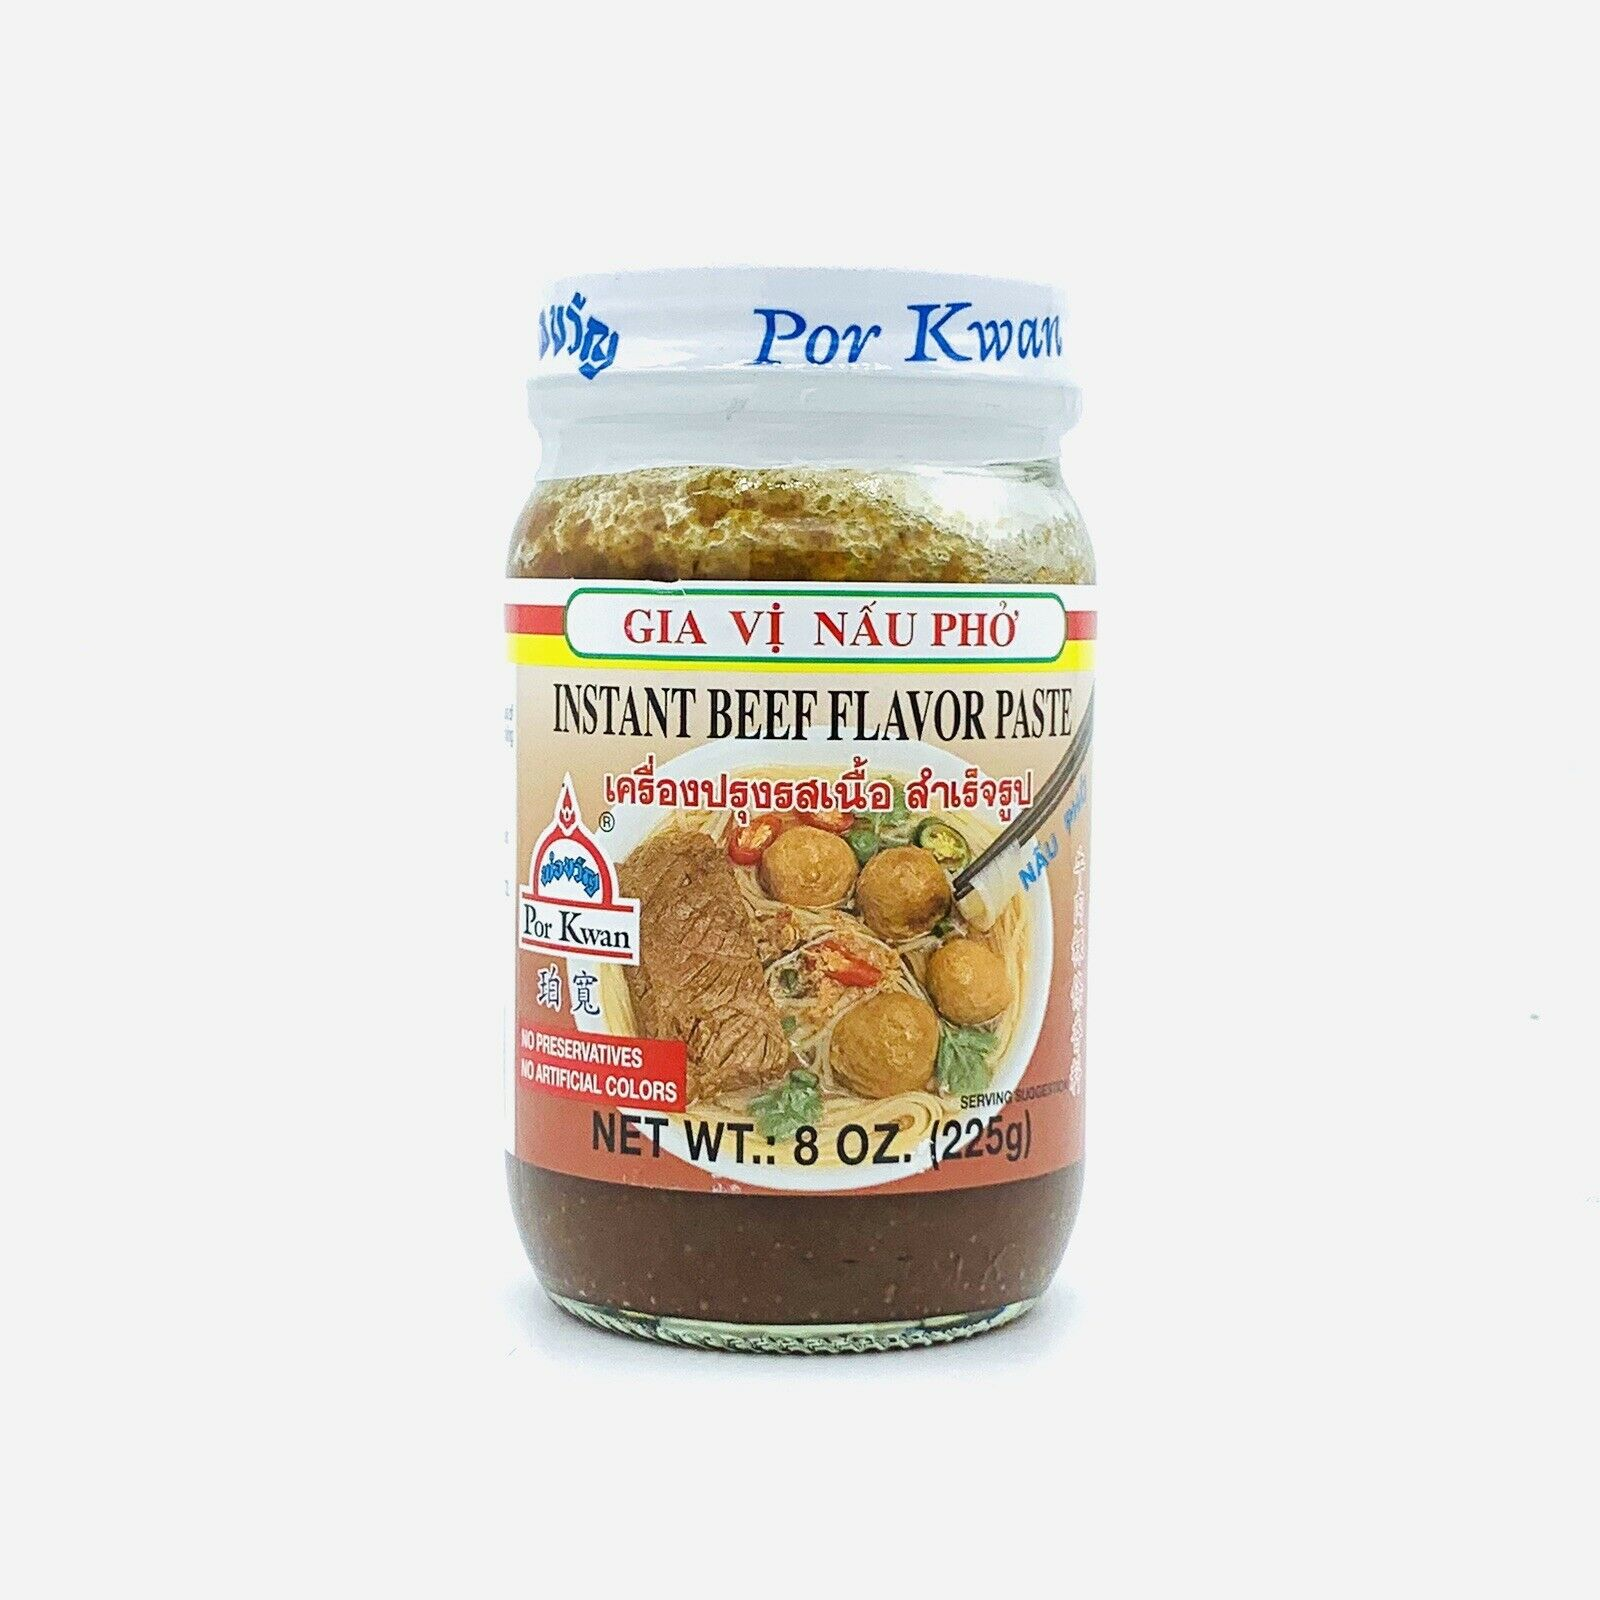 medium por kwan instant beef flavor paste gia vi nau pho 8